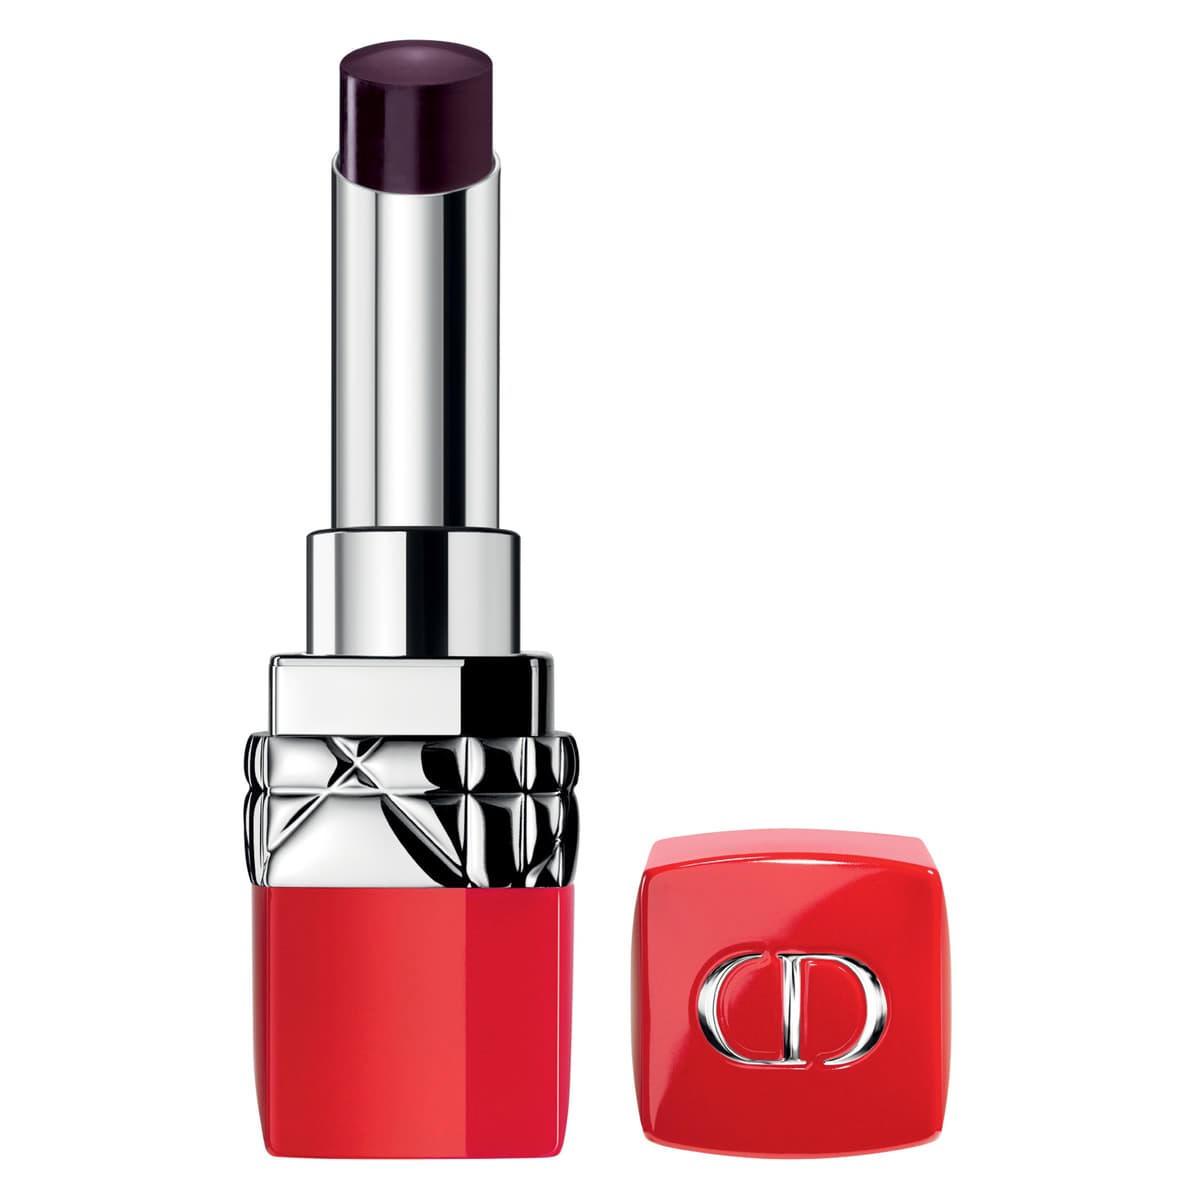 Dior Rouge Ultra Hydra Lipstick Ultra Power 889